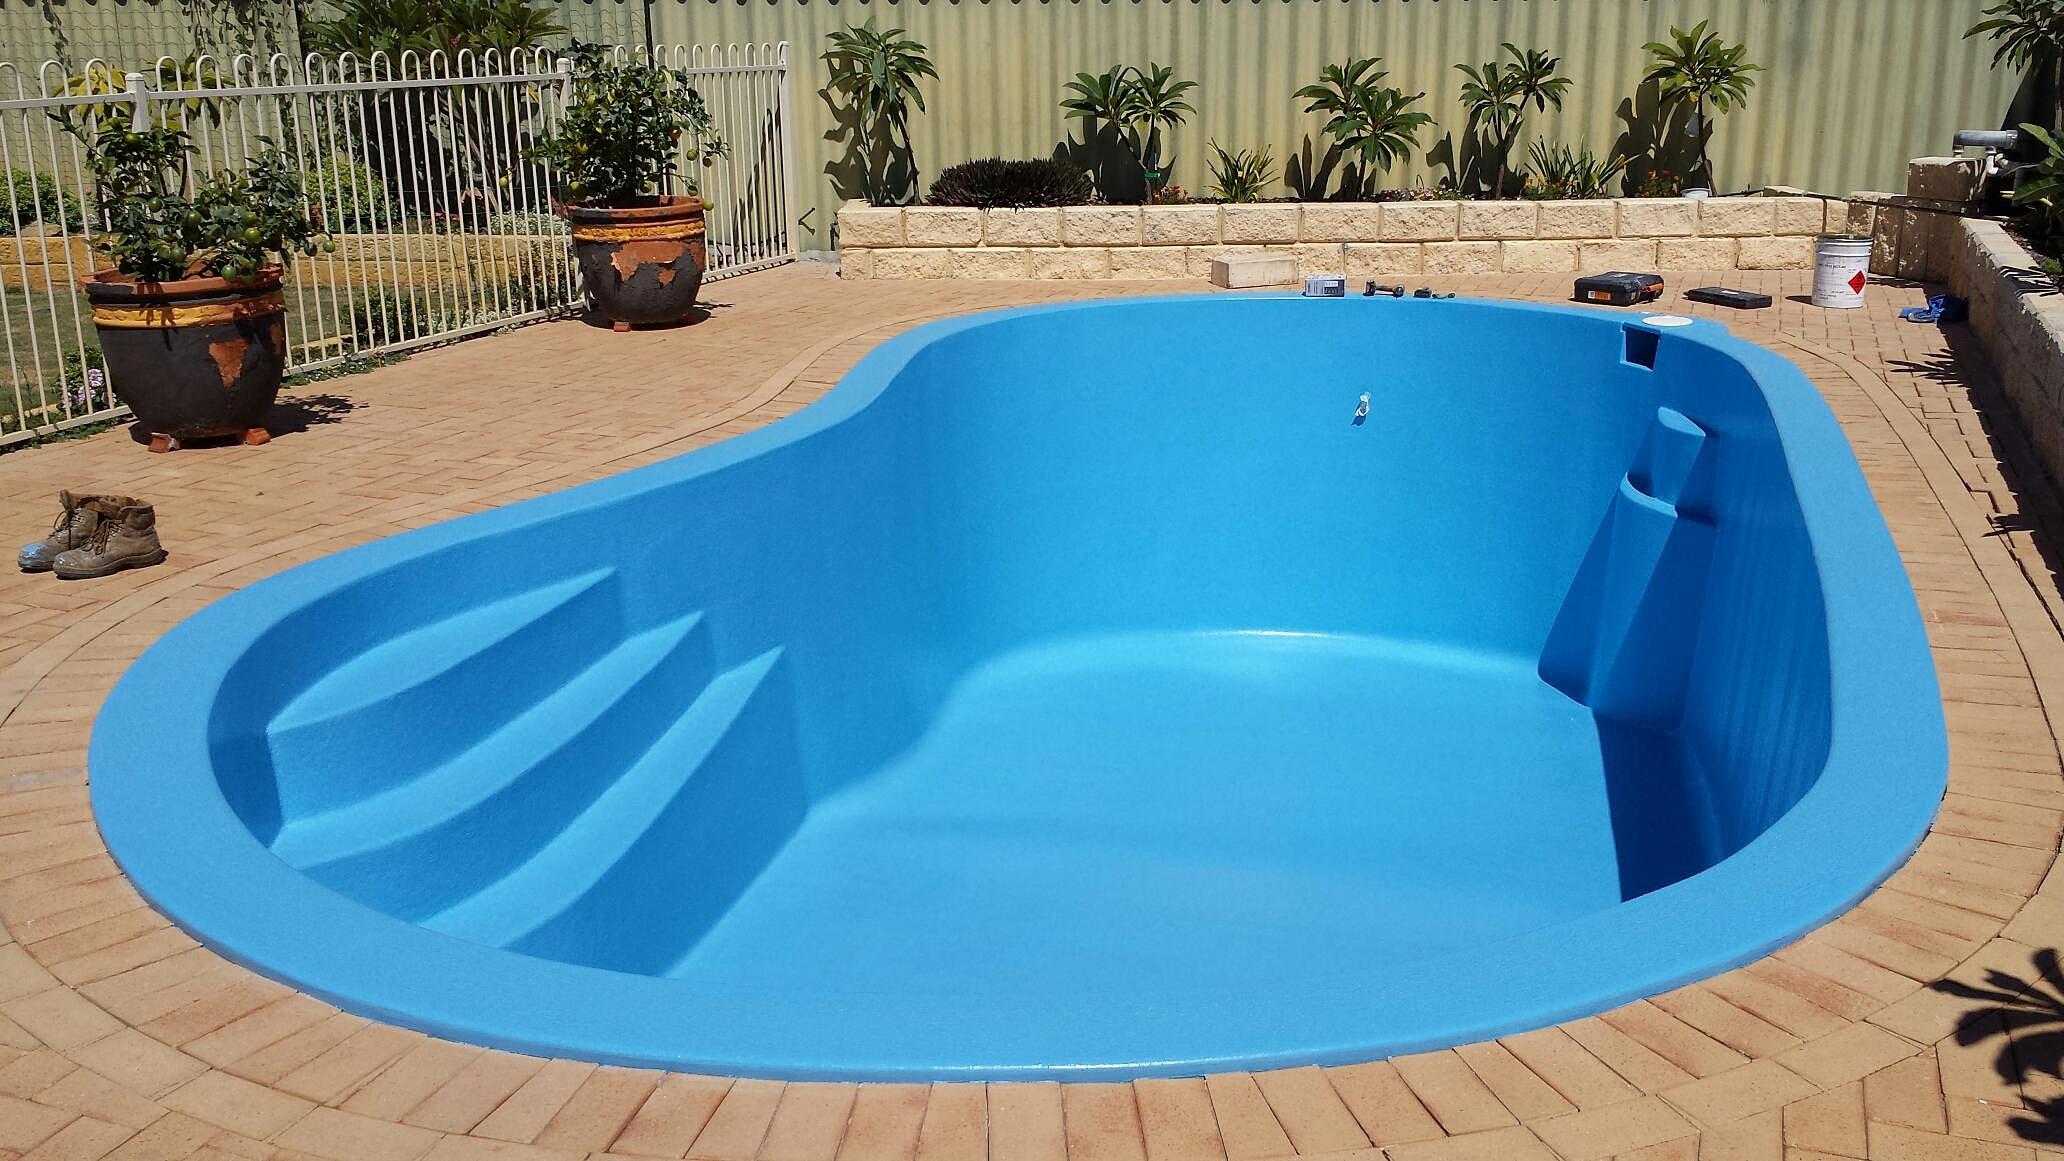 Swimming Pool Restorations : Perth fibreglass pools renovations resurfacing and